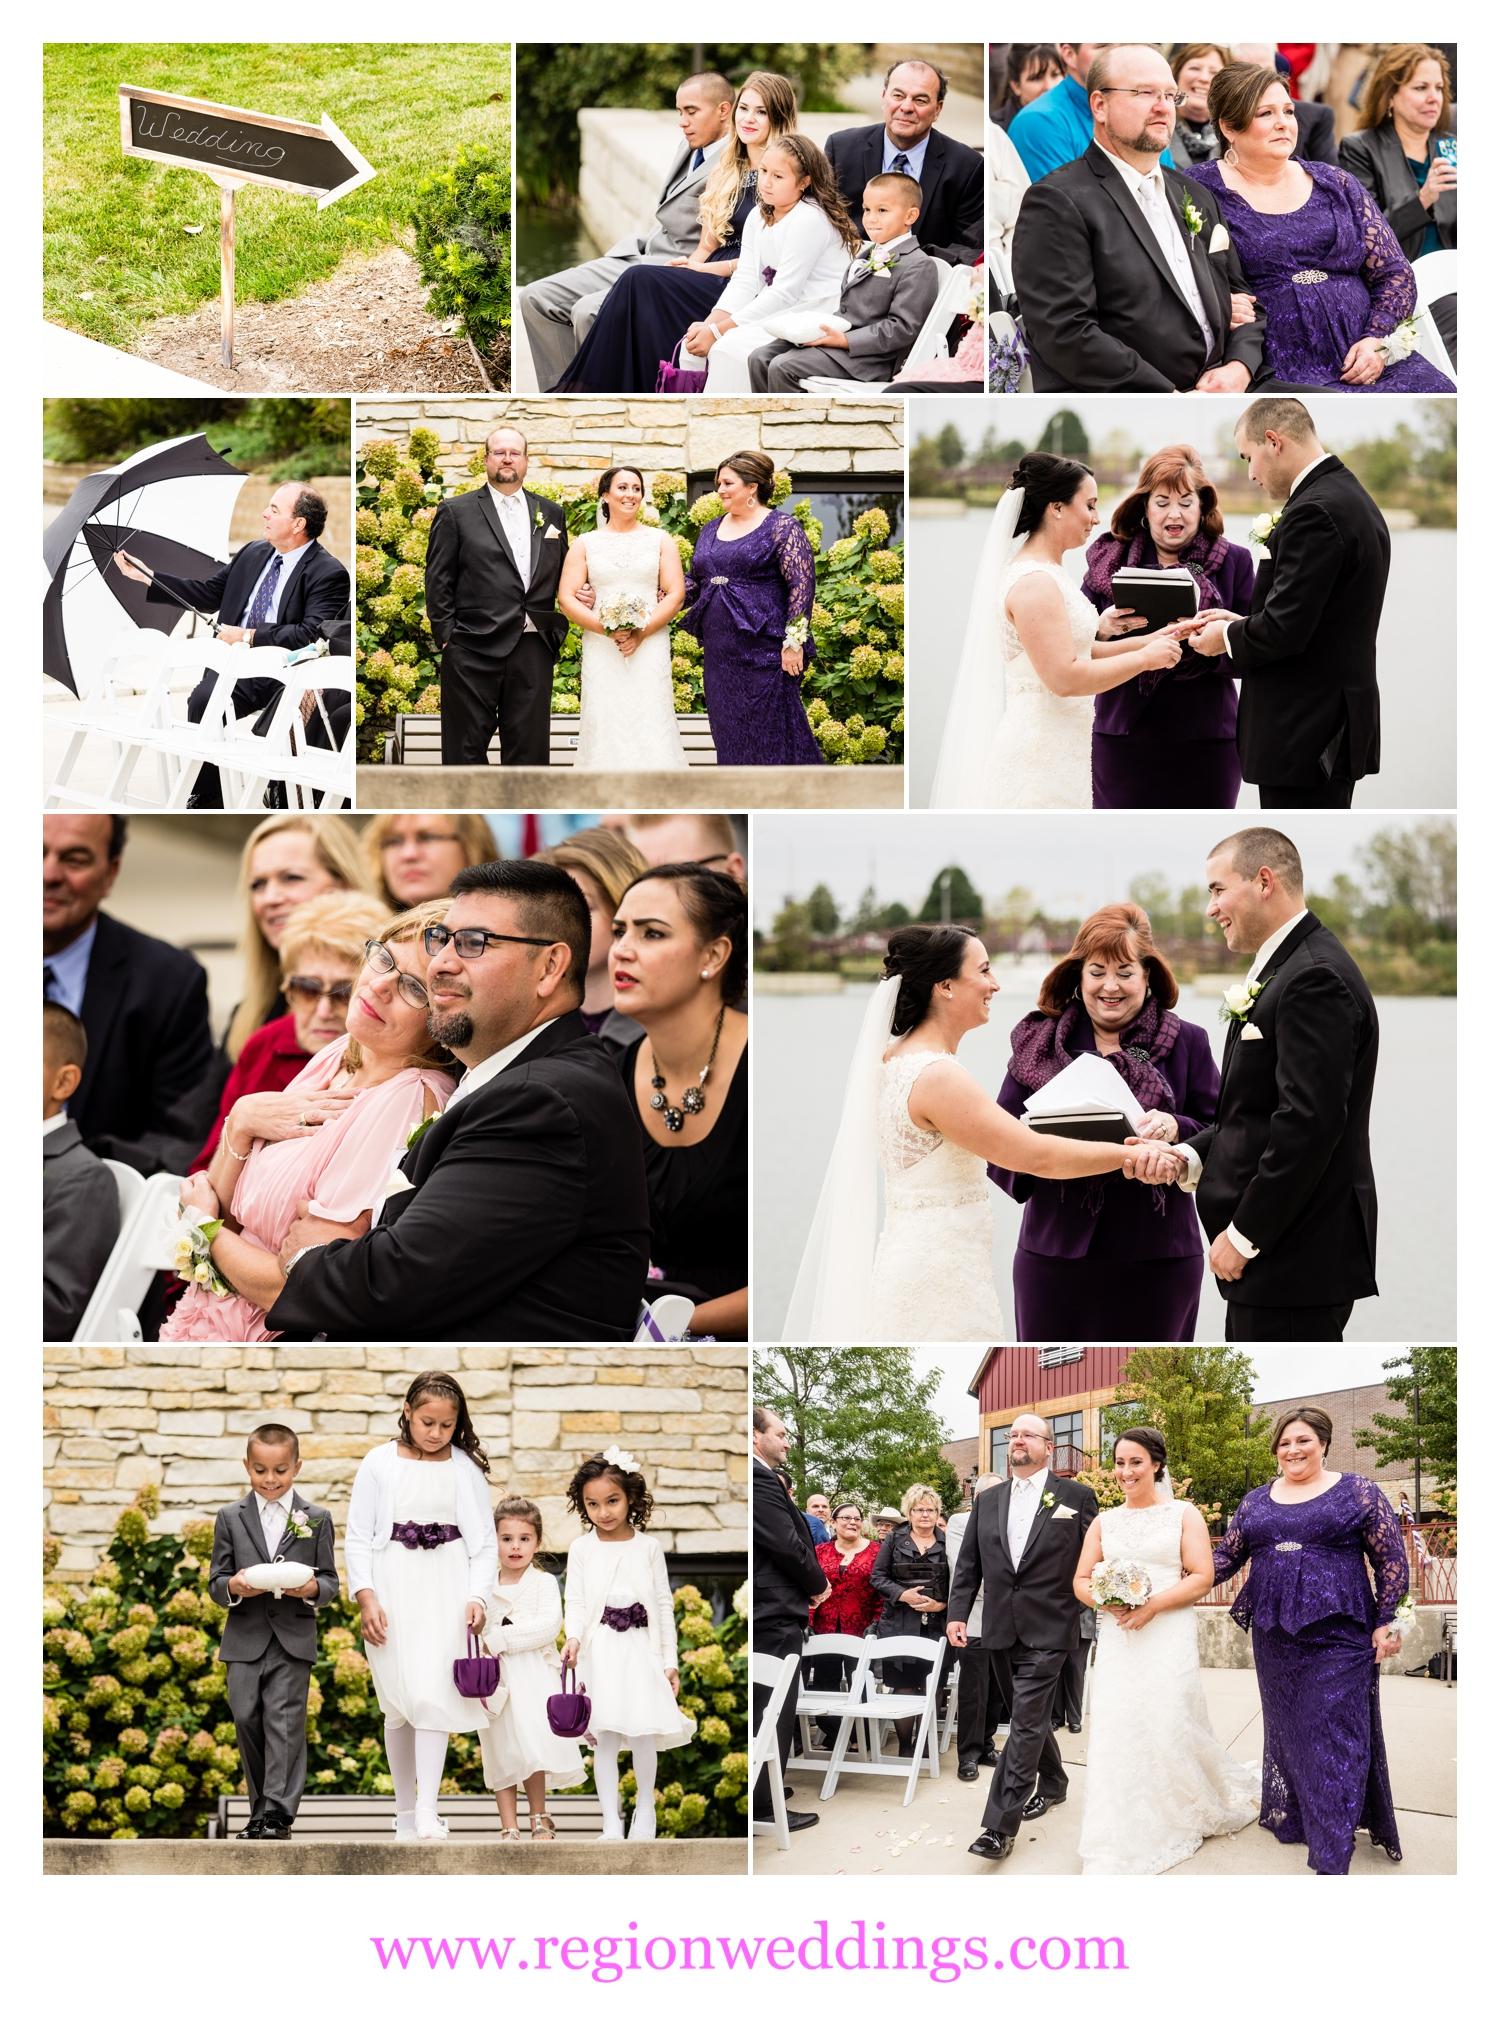 Fall wedding ceremony at Centennial Park.